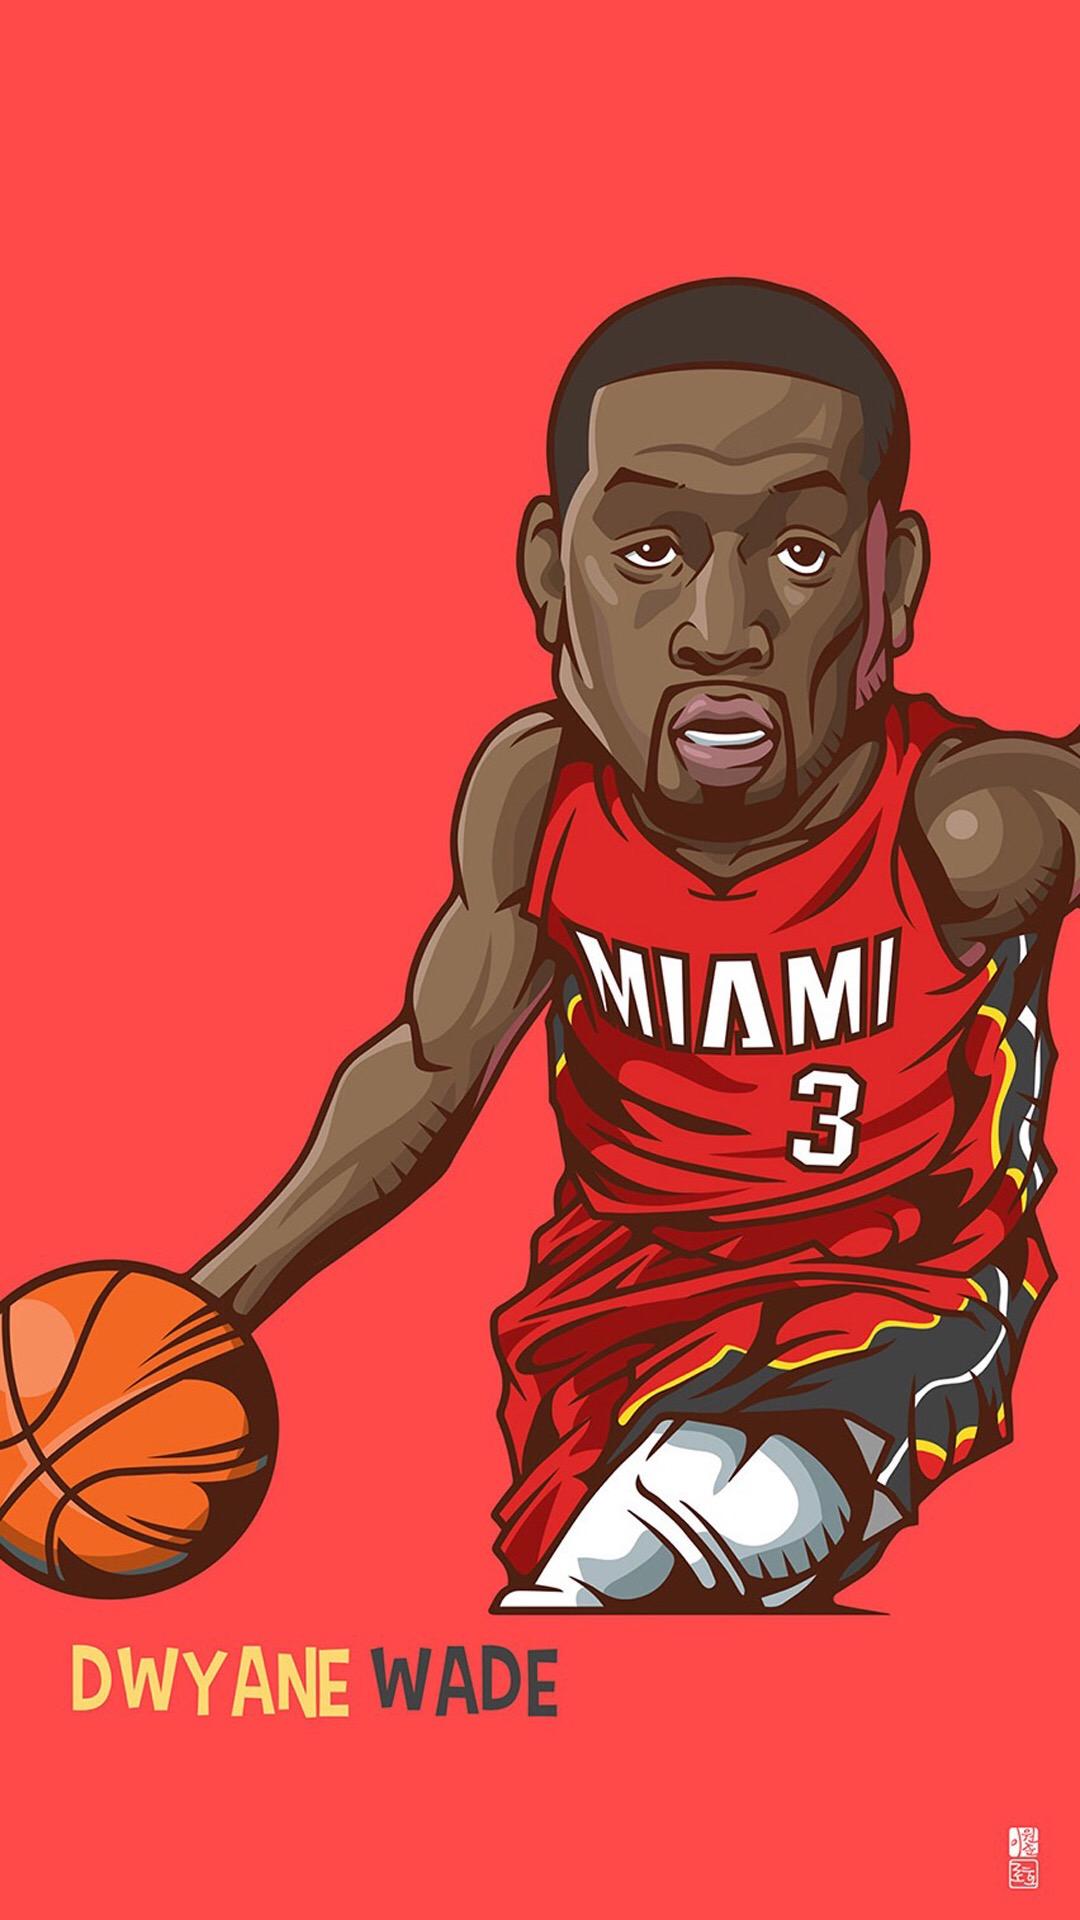 Download-Dwyane-Wade-1080-x-1920-nba-miamiheat-basketball-wade-mobile-wallpaper-wpc9204426